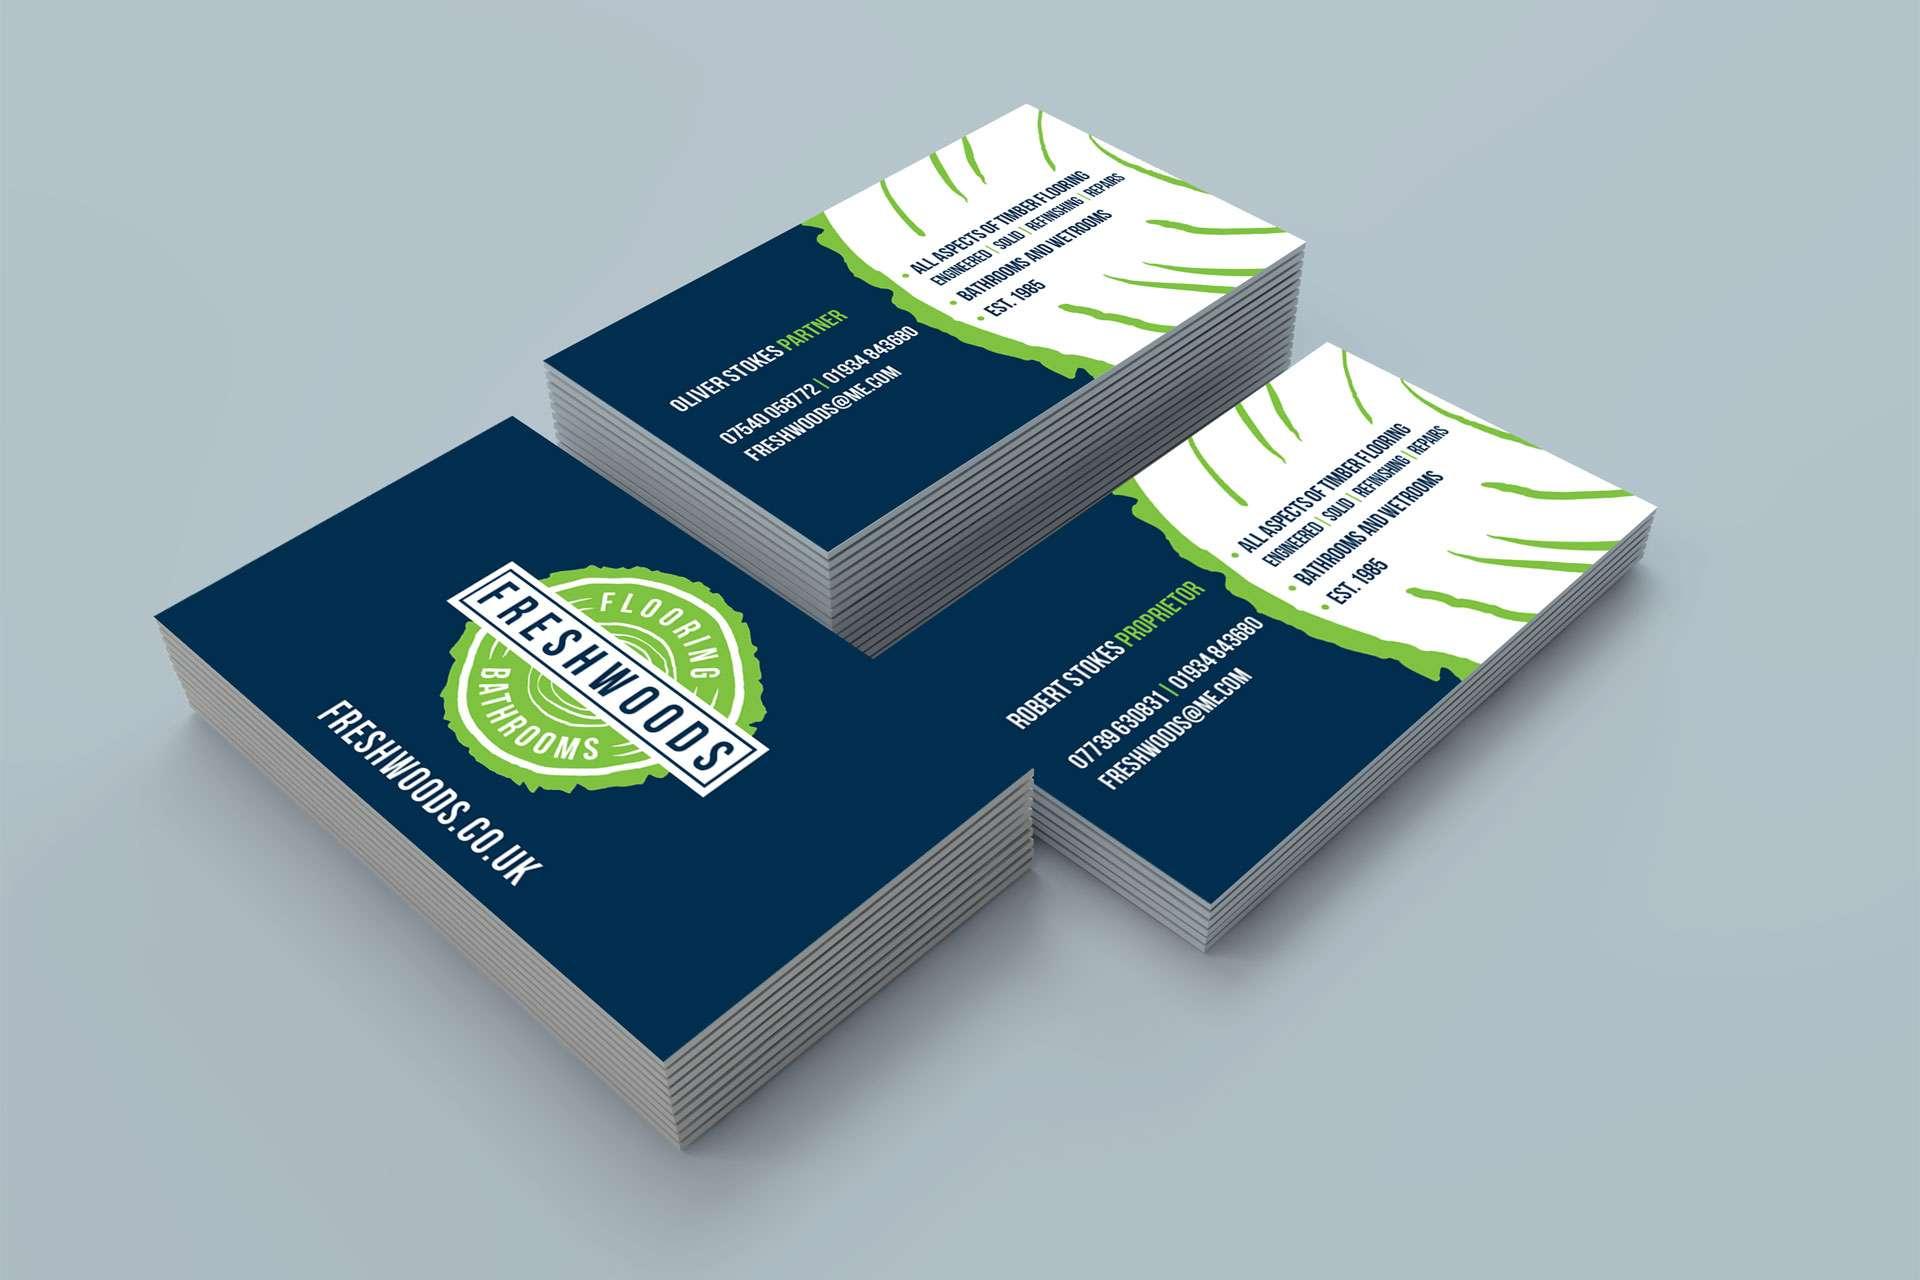 Freshwoods flooring bathrooms business cards somerset